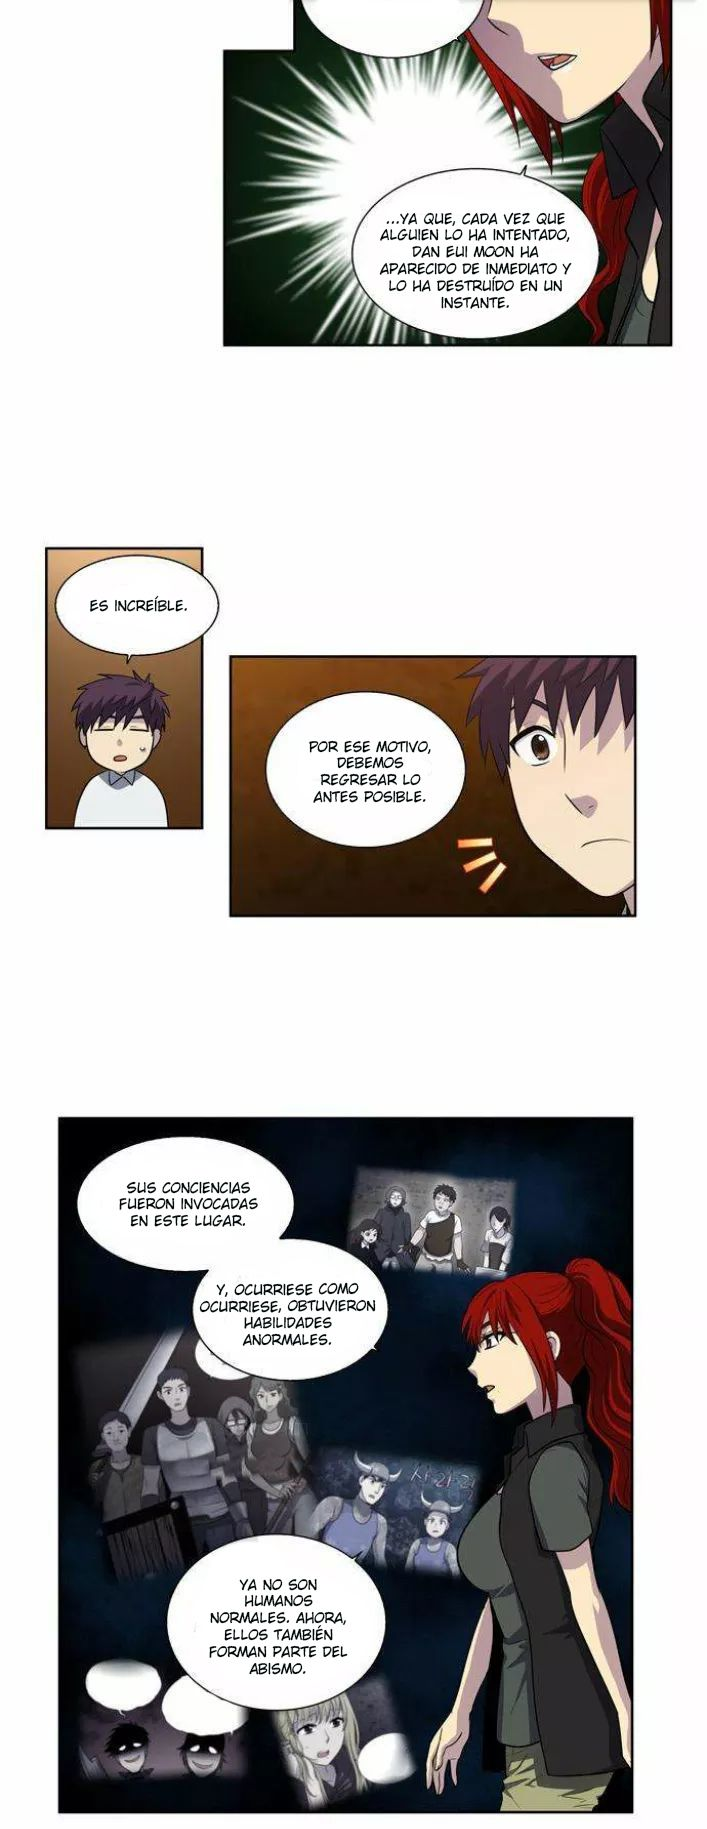 https://c5.ninemanga.com/es_manga/61/1725/485892/97d810f41d48561d74719865ce0841ef.jpg Page 3